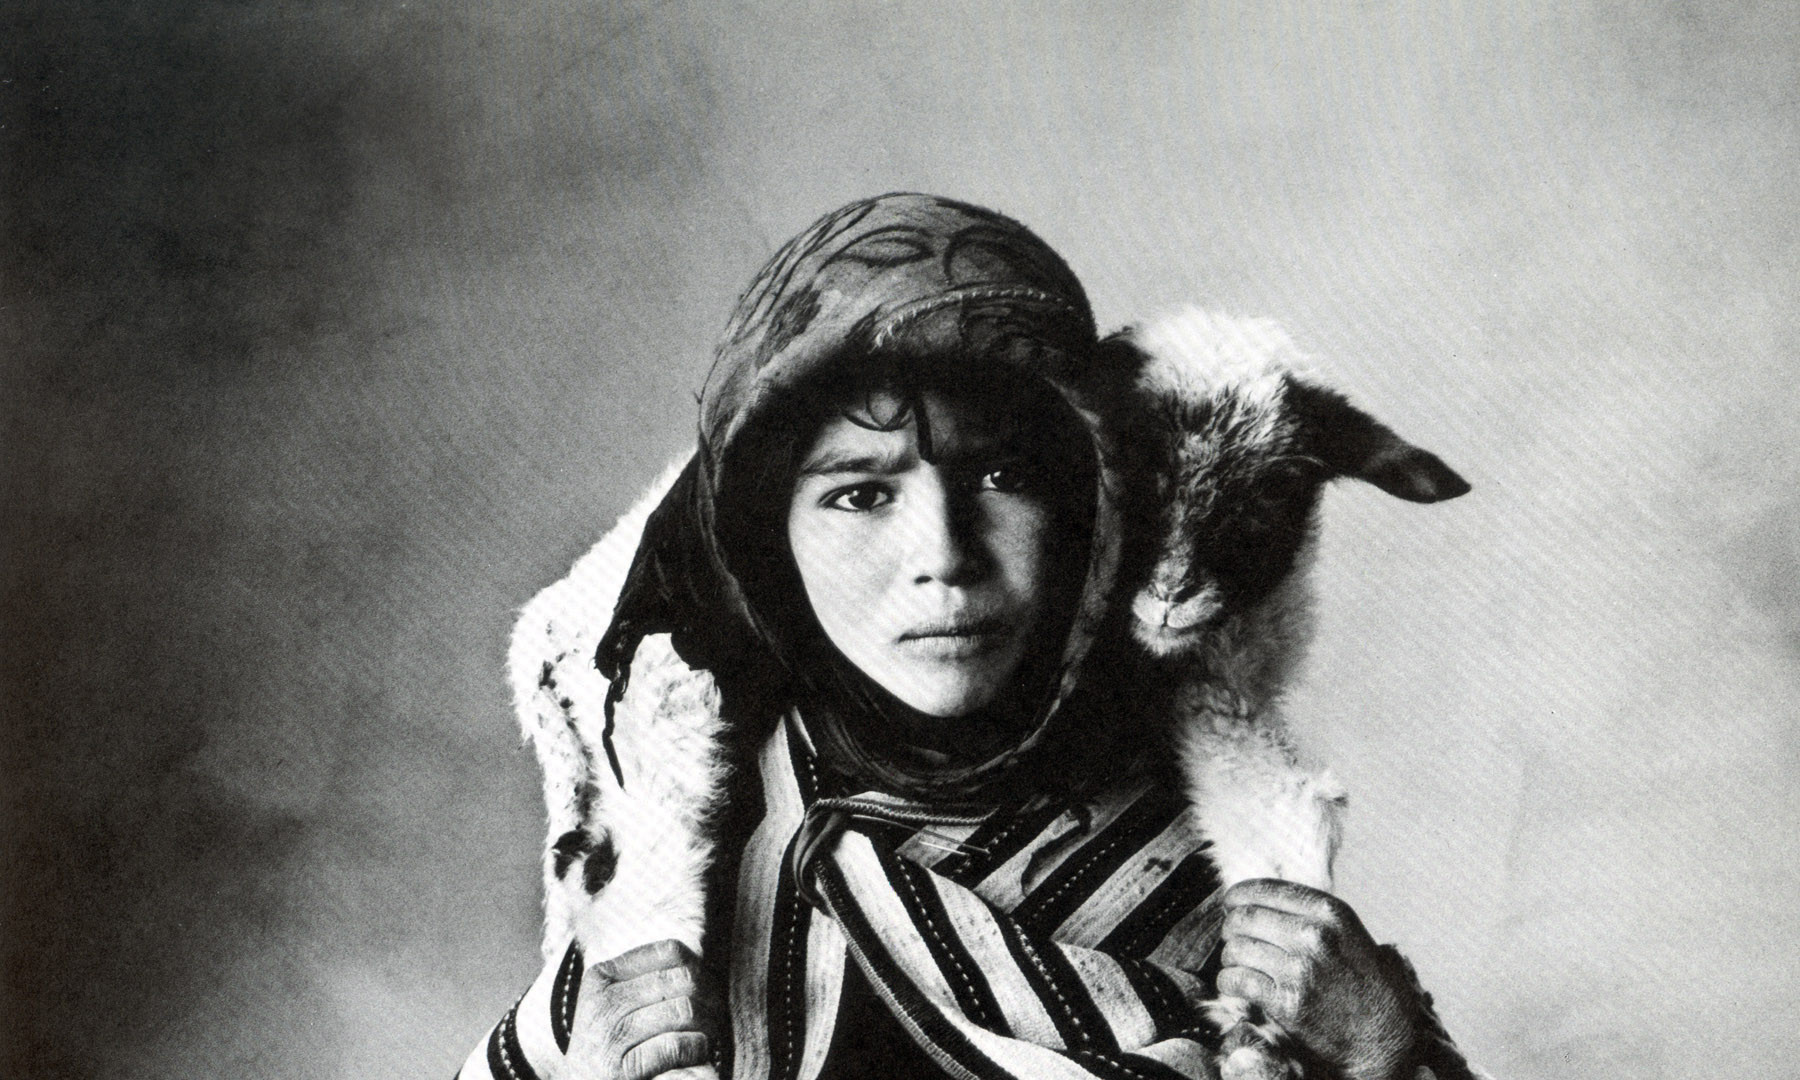 Irving Penn, Young Berber Shepherdess, Morocco, 1971